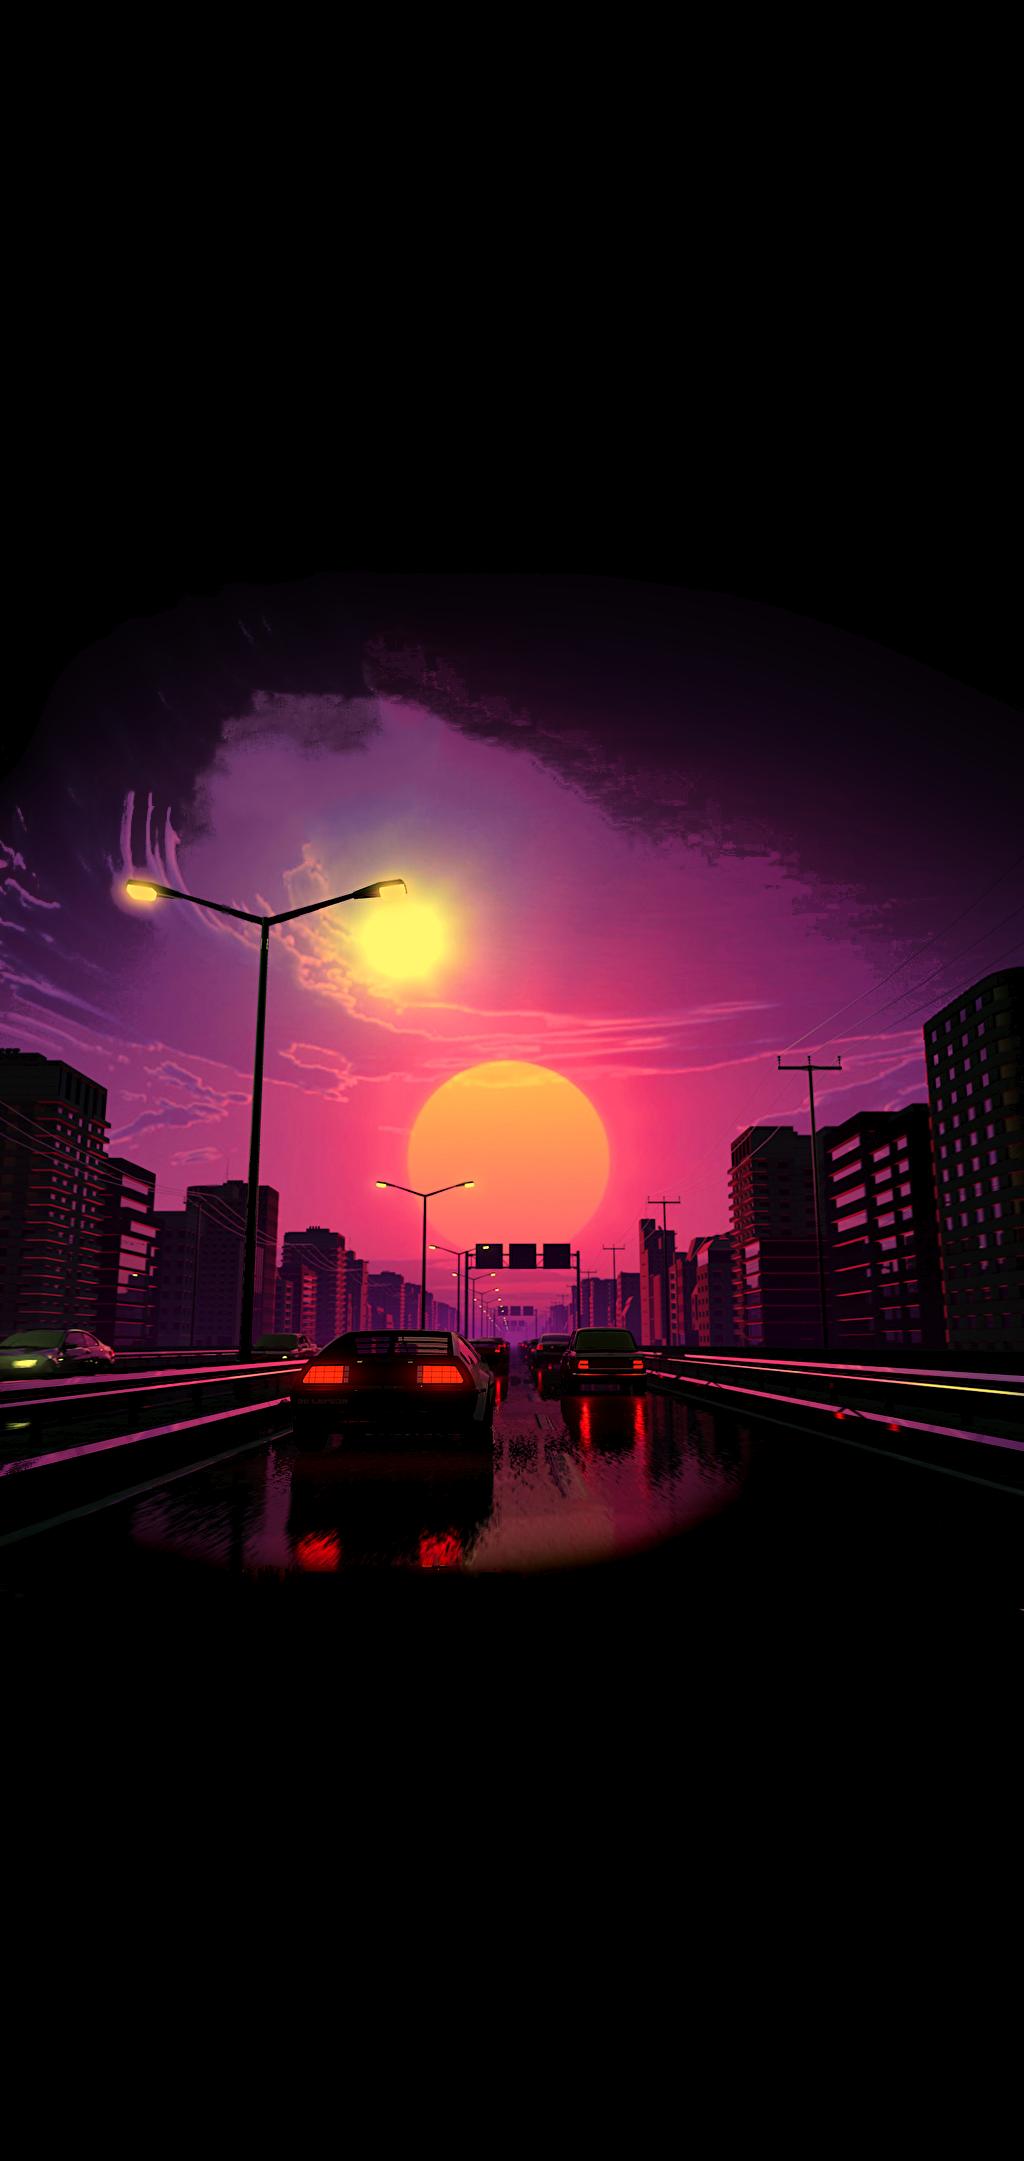 Sunset aesthetic minimal wallpaper Sunset wallpaper Minimal 1024x2161